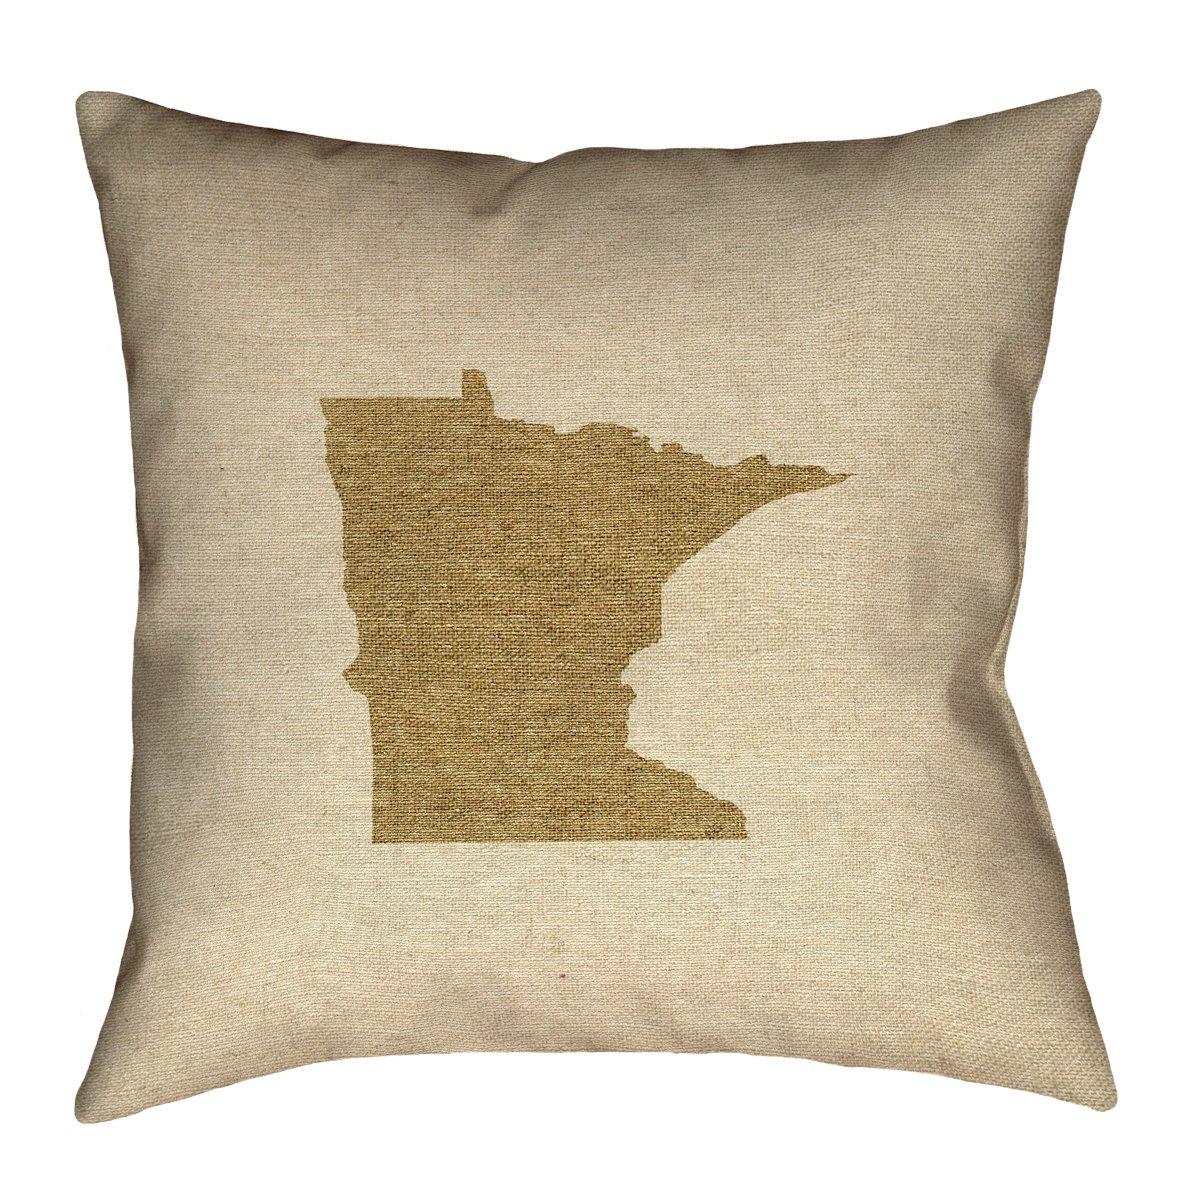 ArtVerse Katelyn Smith 14 x 14 Spun Polyester Minnesota Canvas Pillow